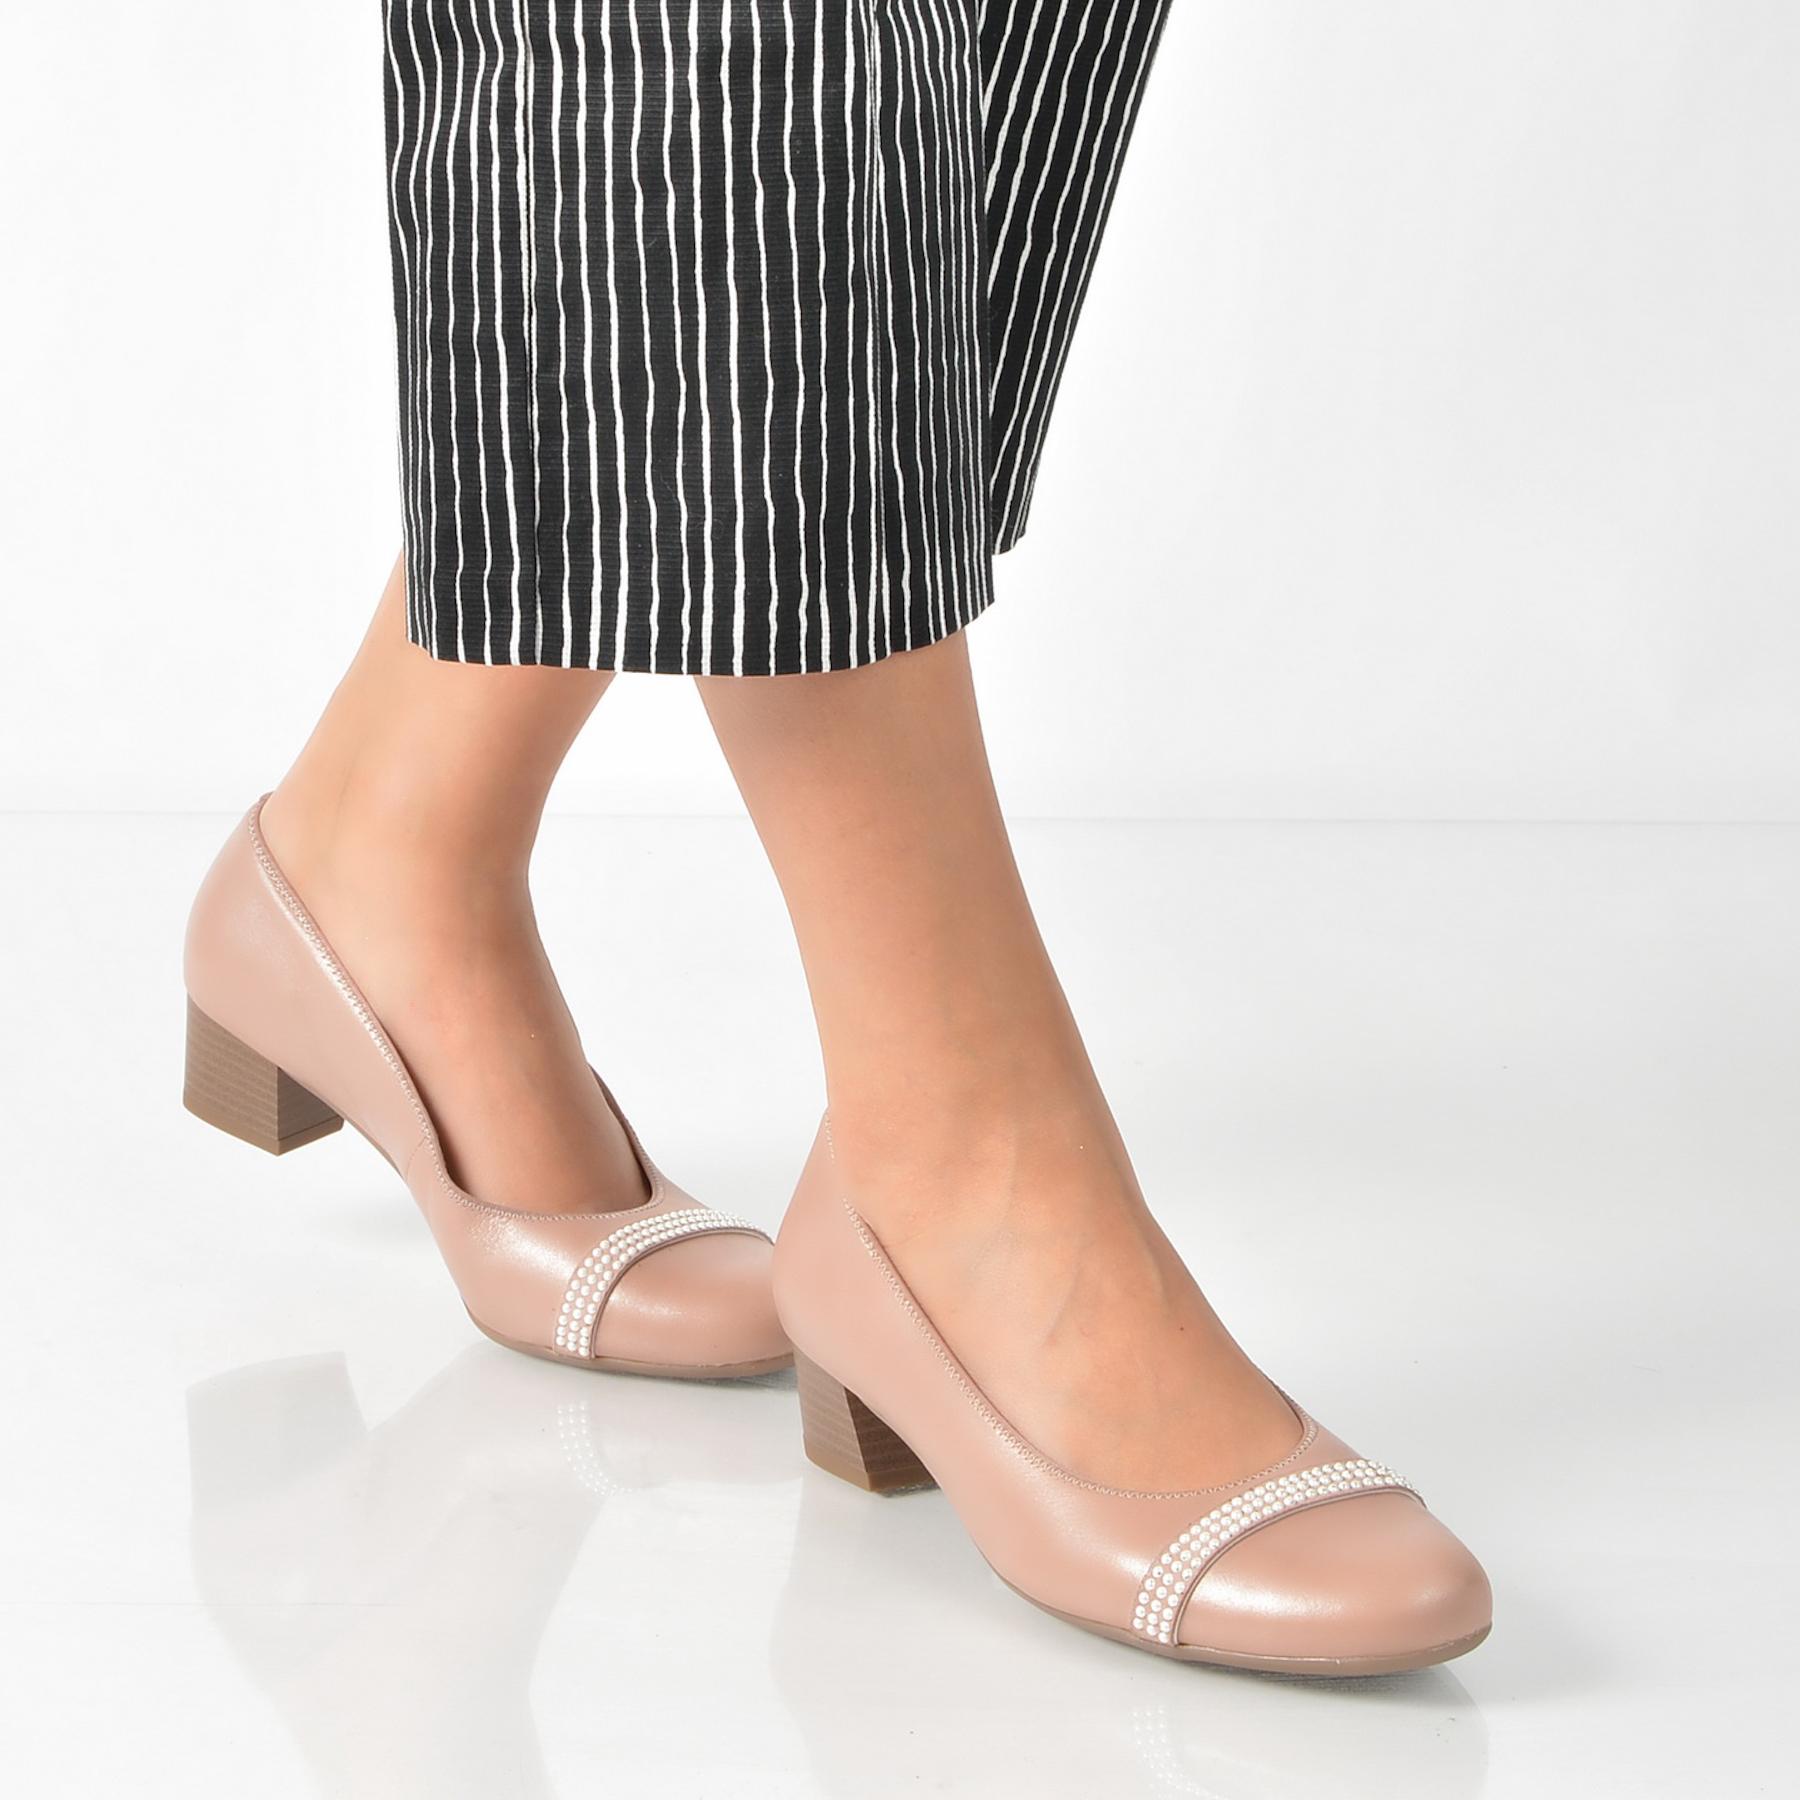 Pantofi Ara Roz, 35848, Din Piele Naturala